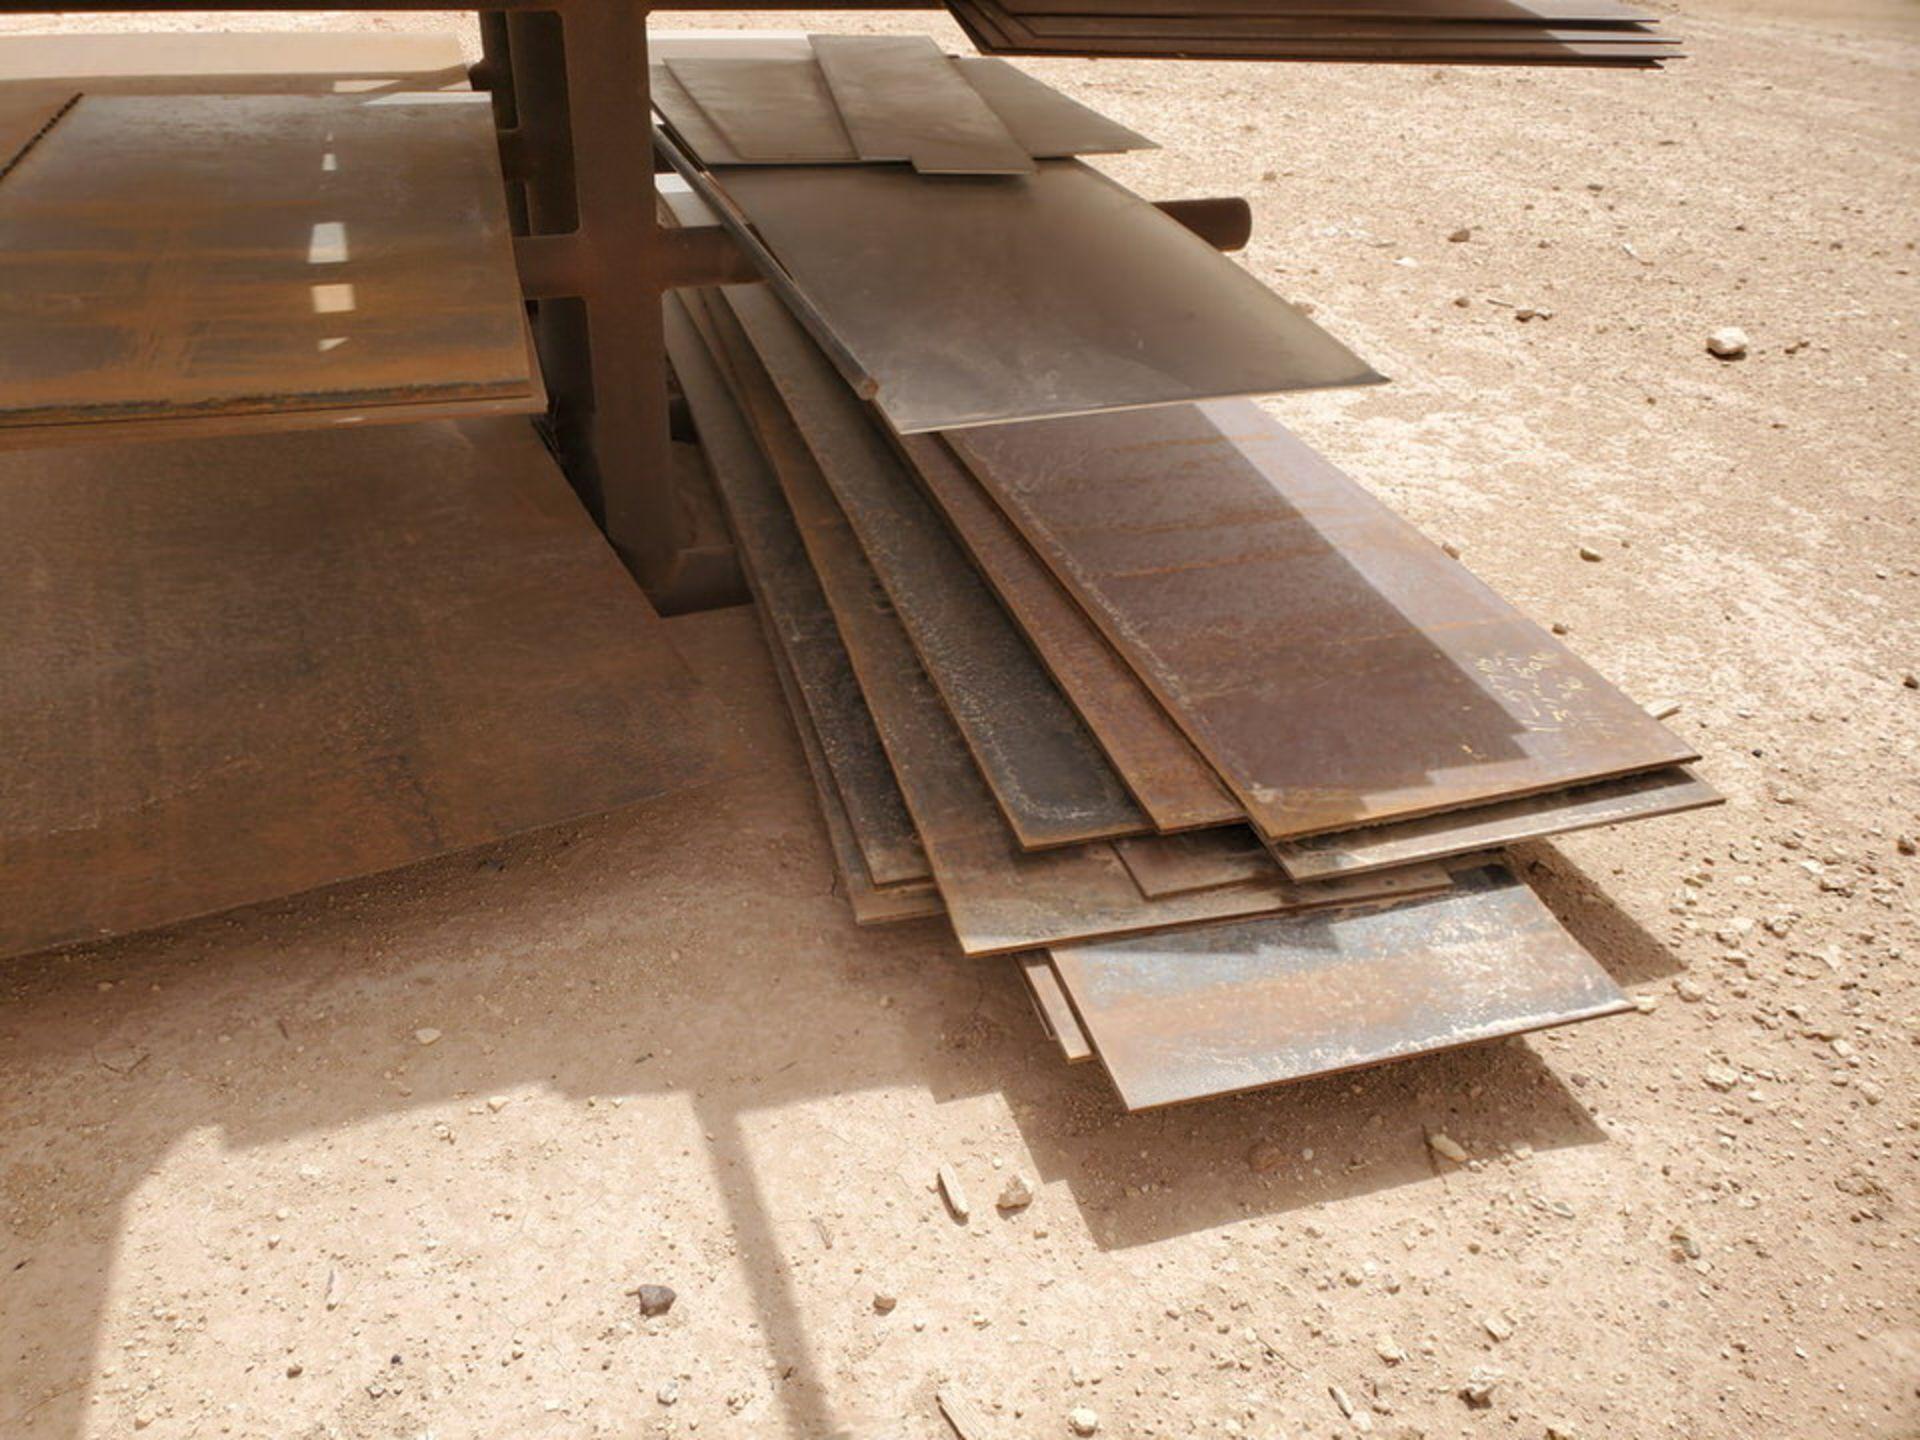 "Flat Bar & Metal Sheets L: 3' - 15', W: 1' - 5'7-1/2"", Thk: 3/16"" - 9/16""; W/ Racks - Image 11 of 12"